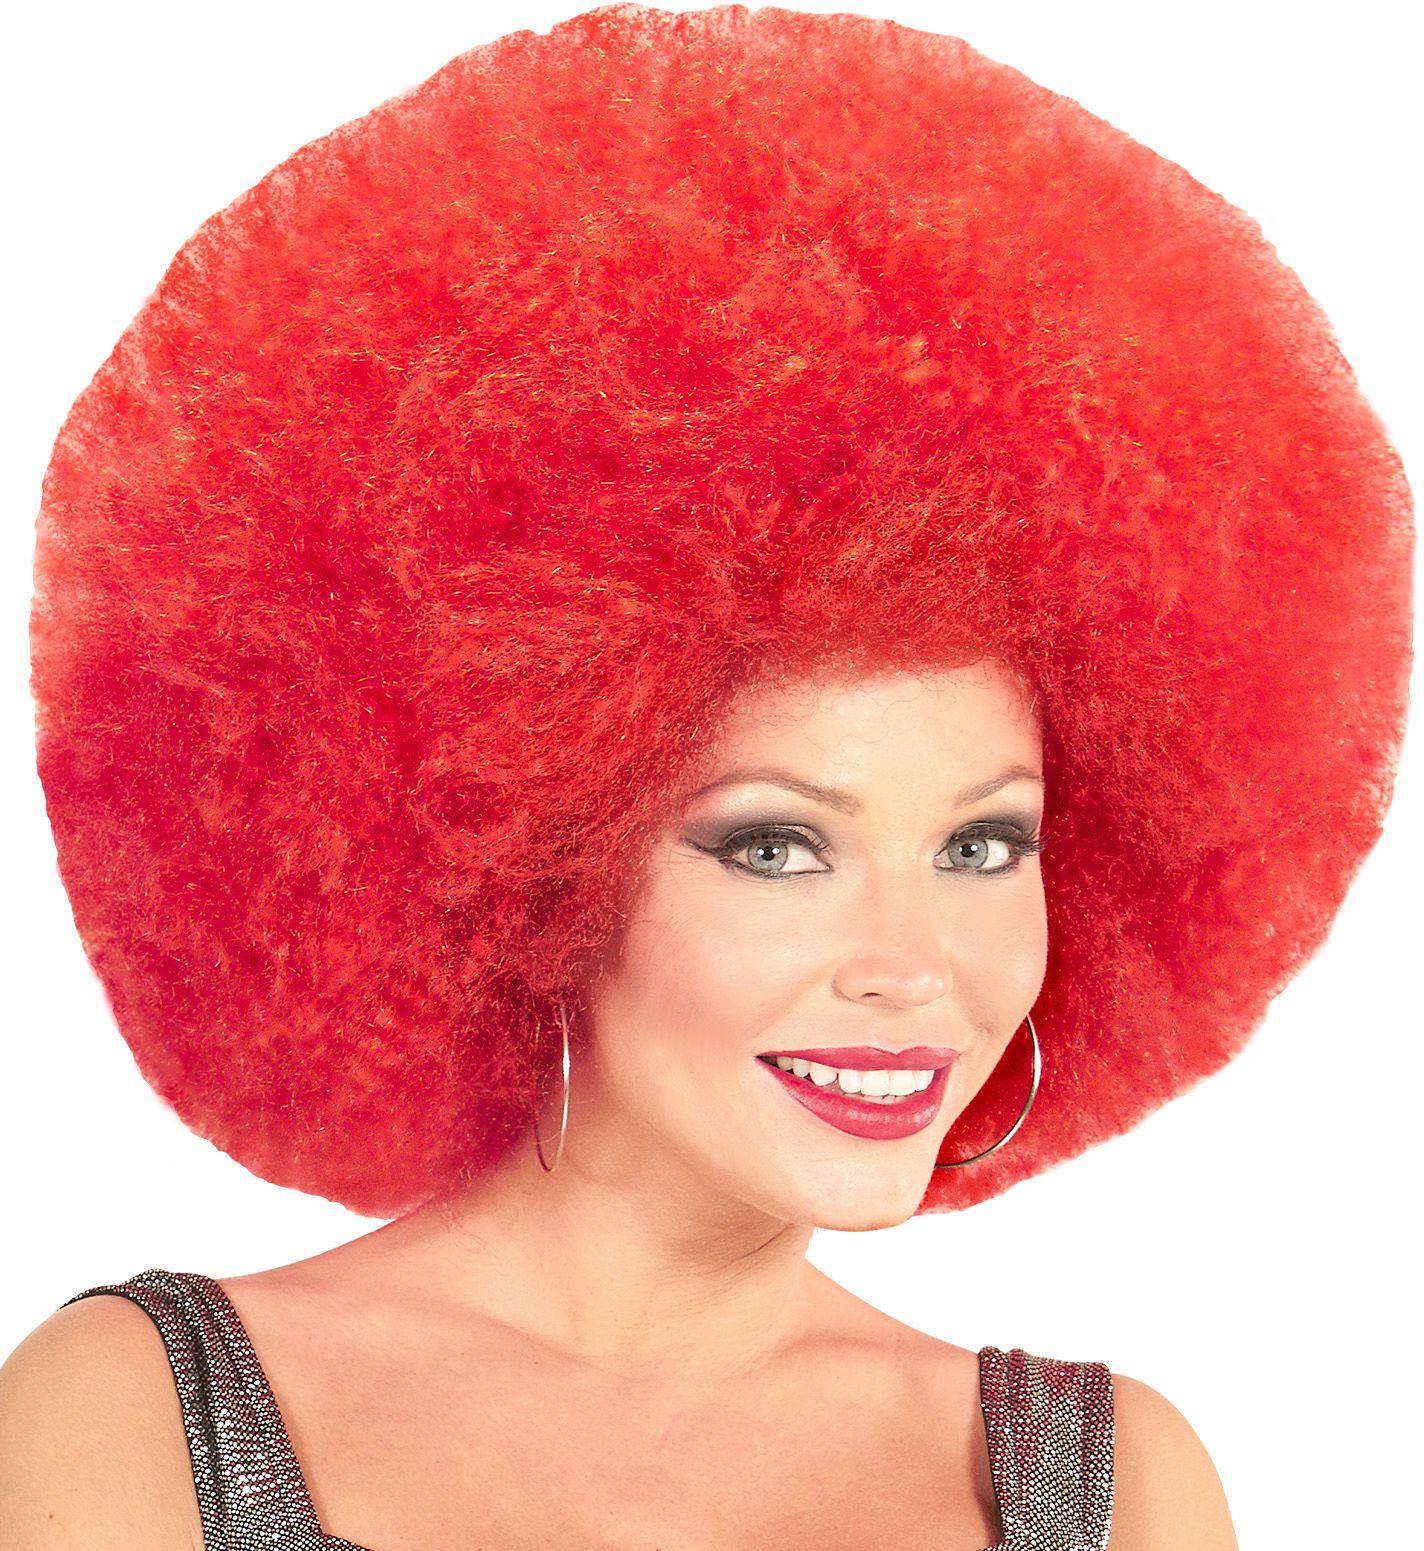 Rode afro pruik extra groot